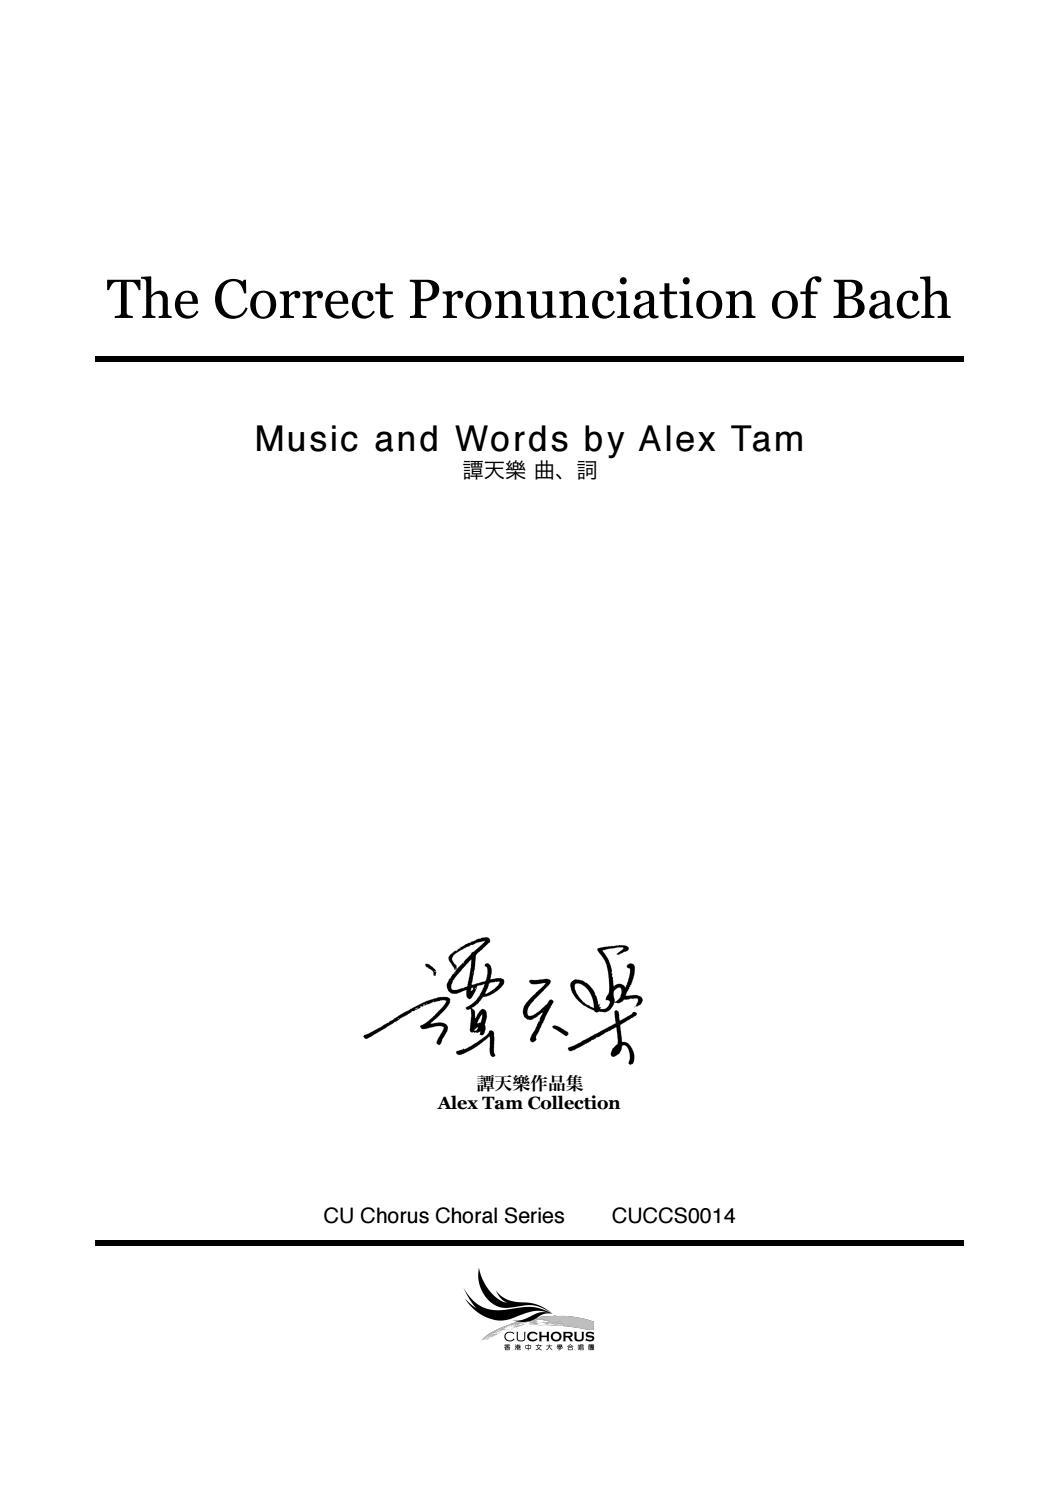 CUCCS12 The Correct Pronunciation of Bach by CU Chorus 中大合唱